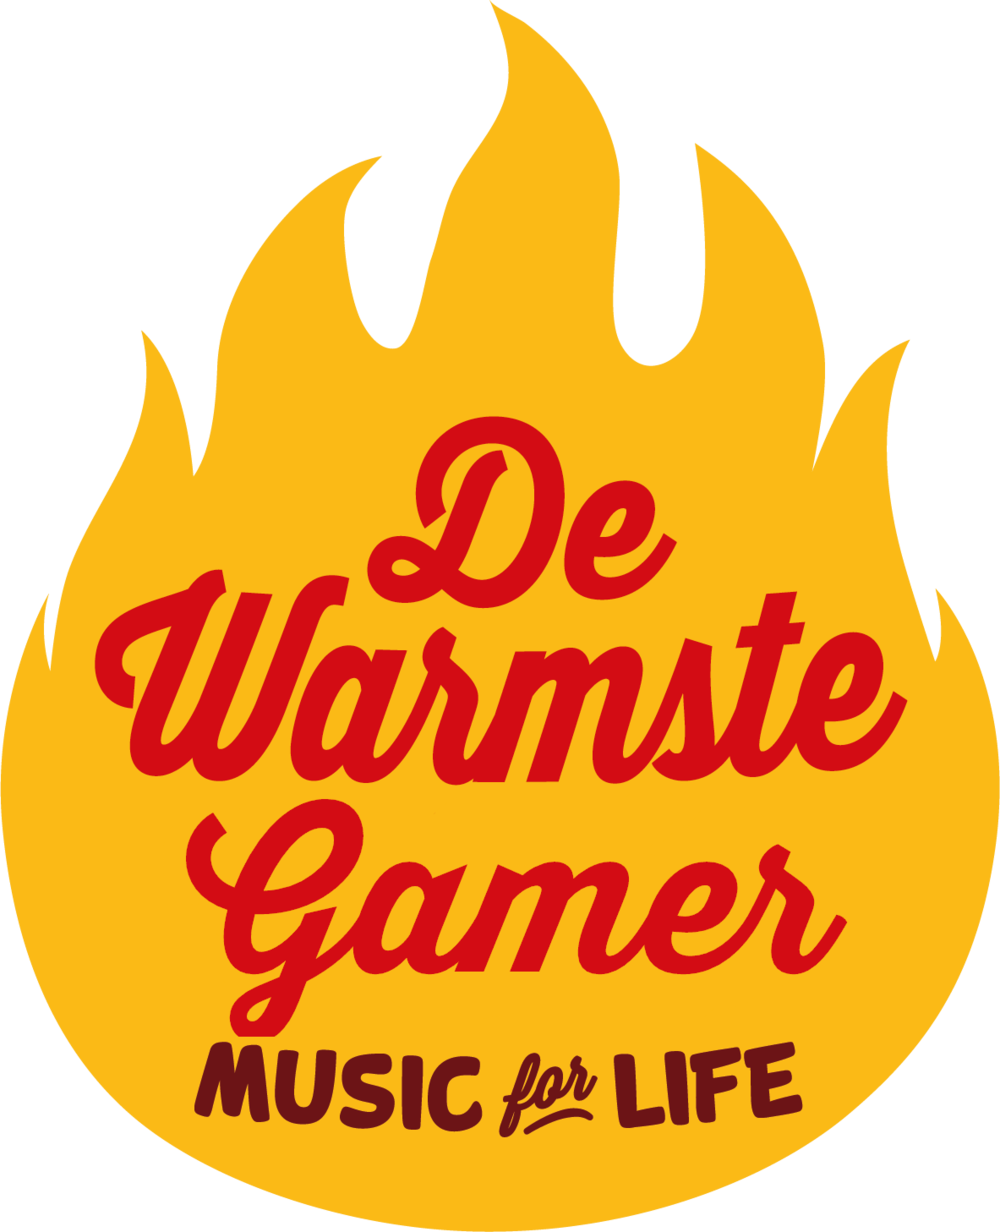 Warmste Gamer.png